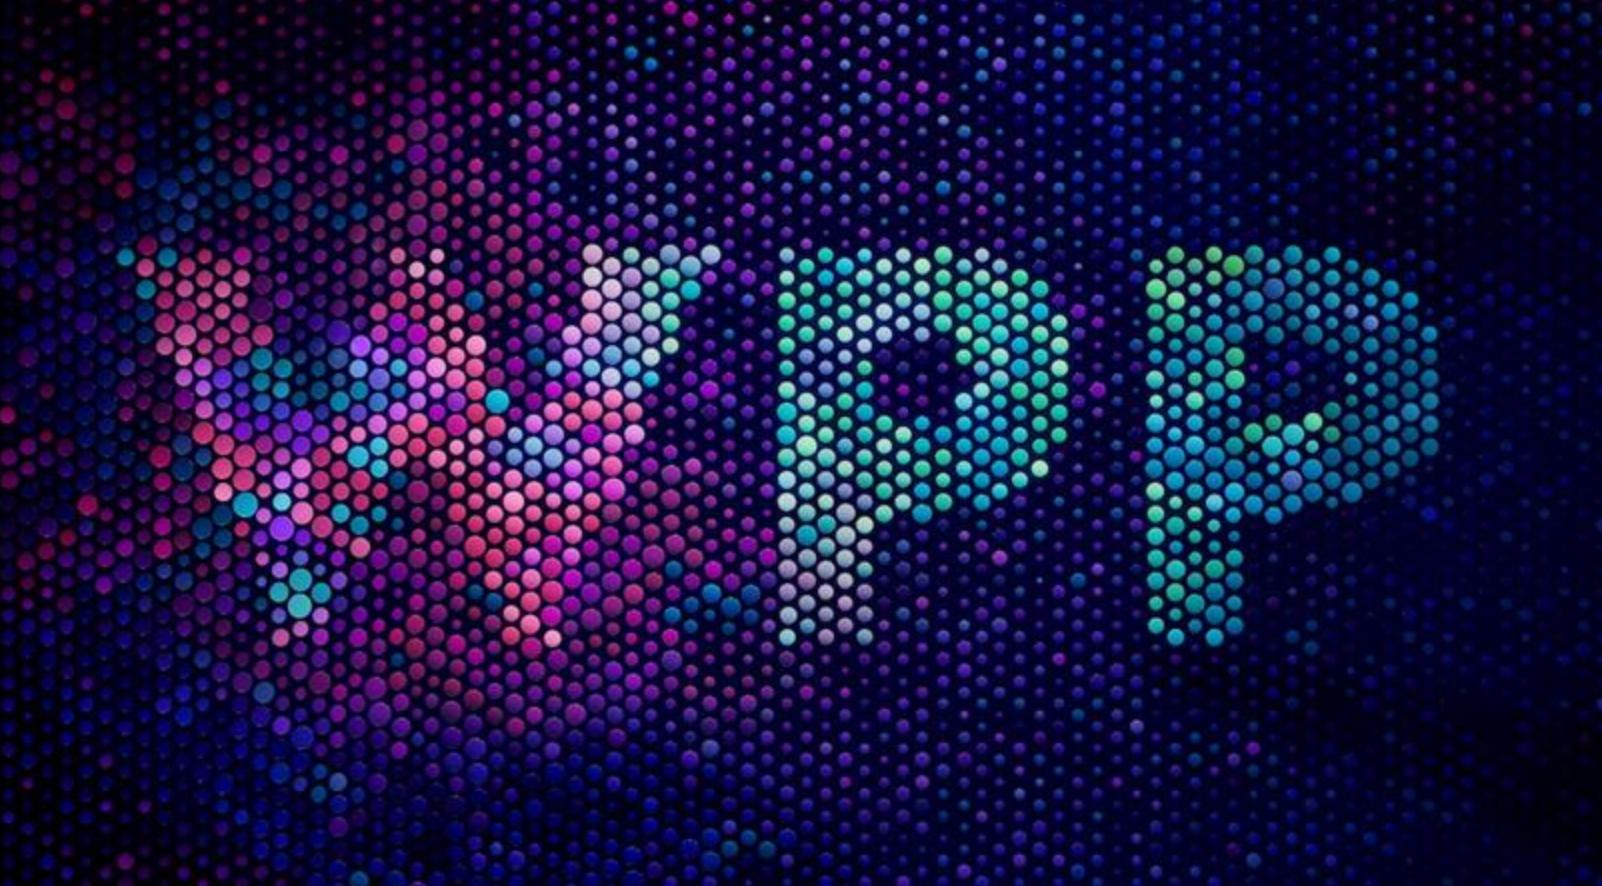 Cornavirus crisis:WPP worldwide cuts awards, travel, hotels, freezes hiring, reduces top salaries, reviews freelance expenditure